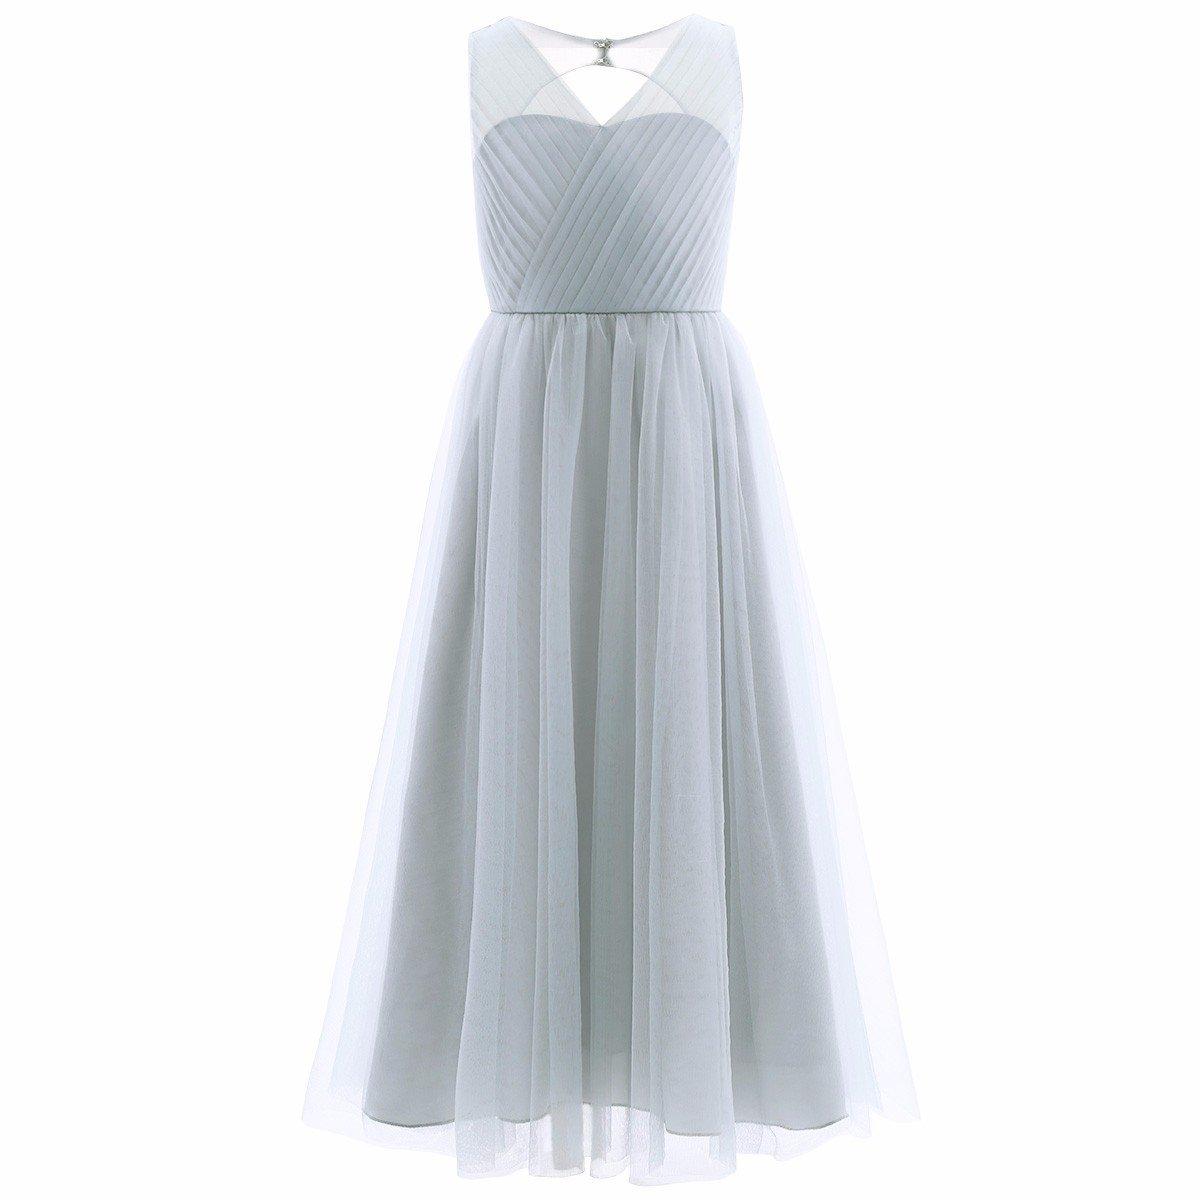 Amazon.com: FEESHOW Big Girls Flower Junior Bridesmaid Wedding Gown ...